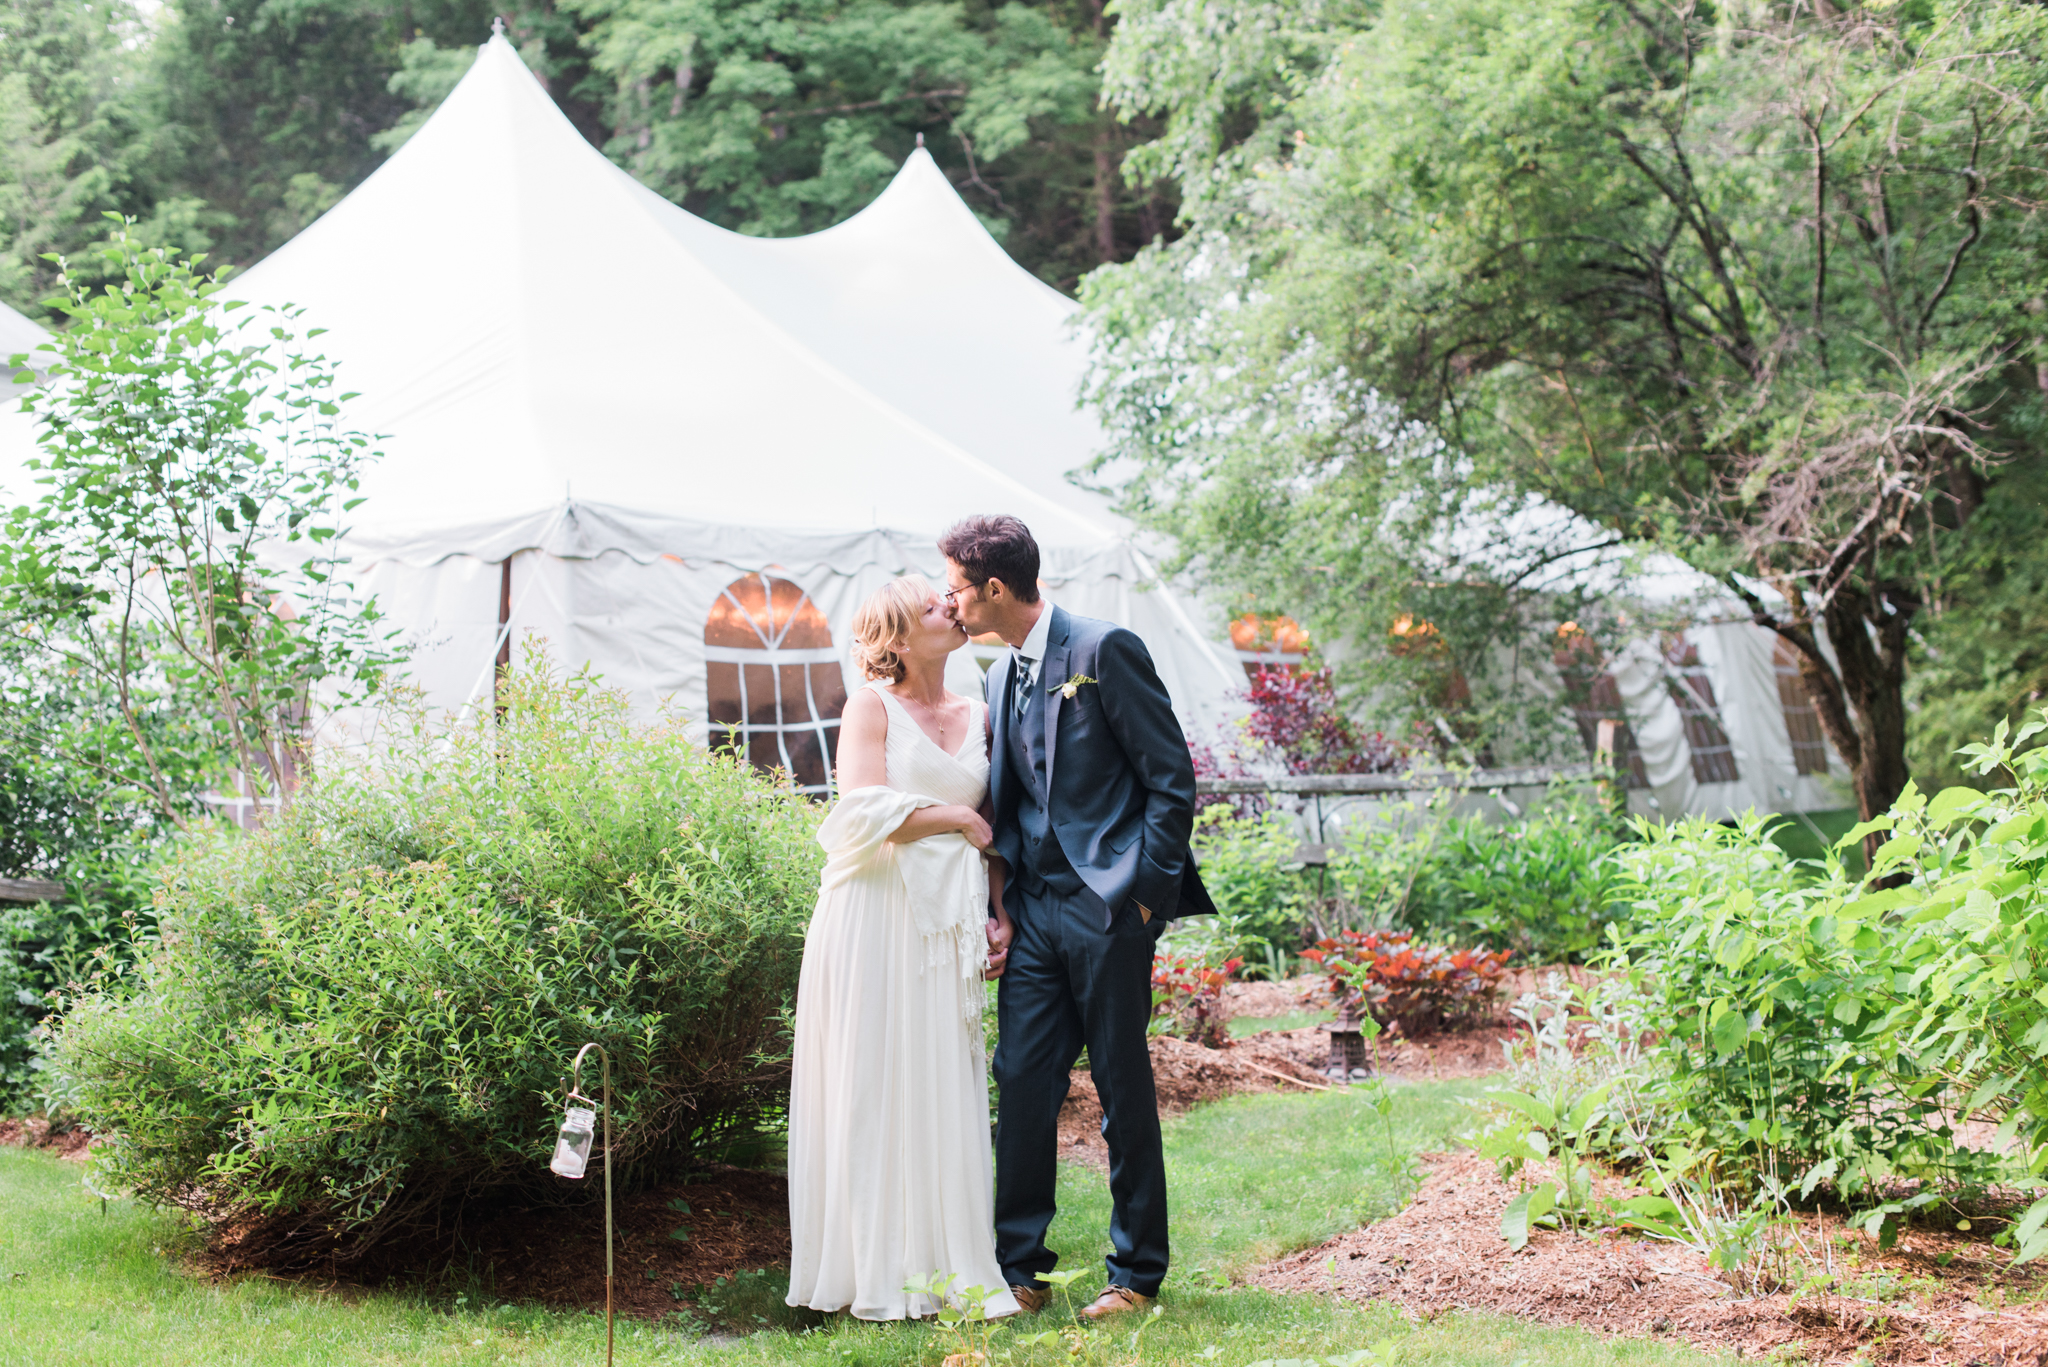 melaniezacekphotography-northampton-wedding-photographer-0026.jpg